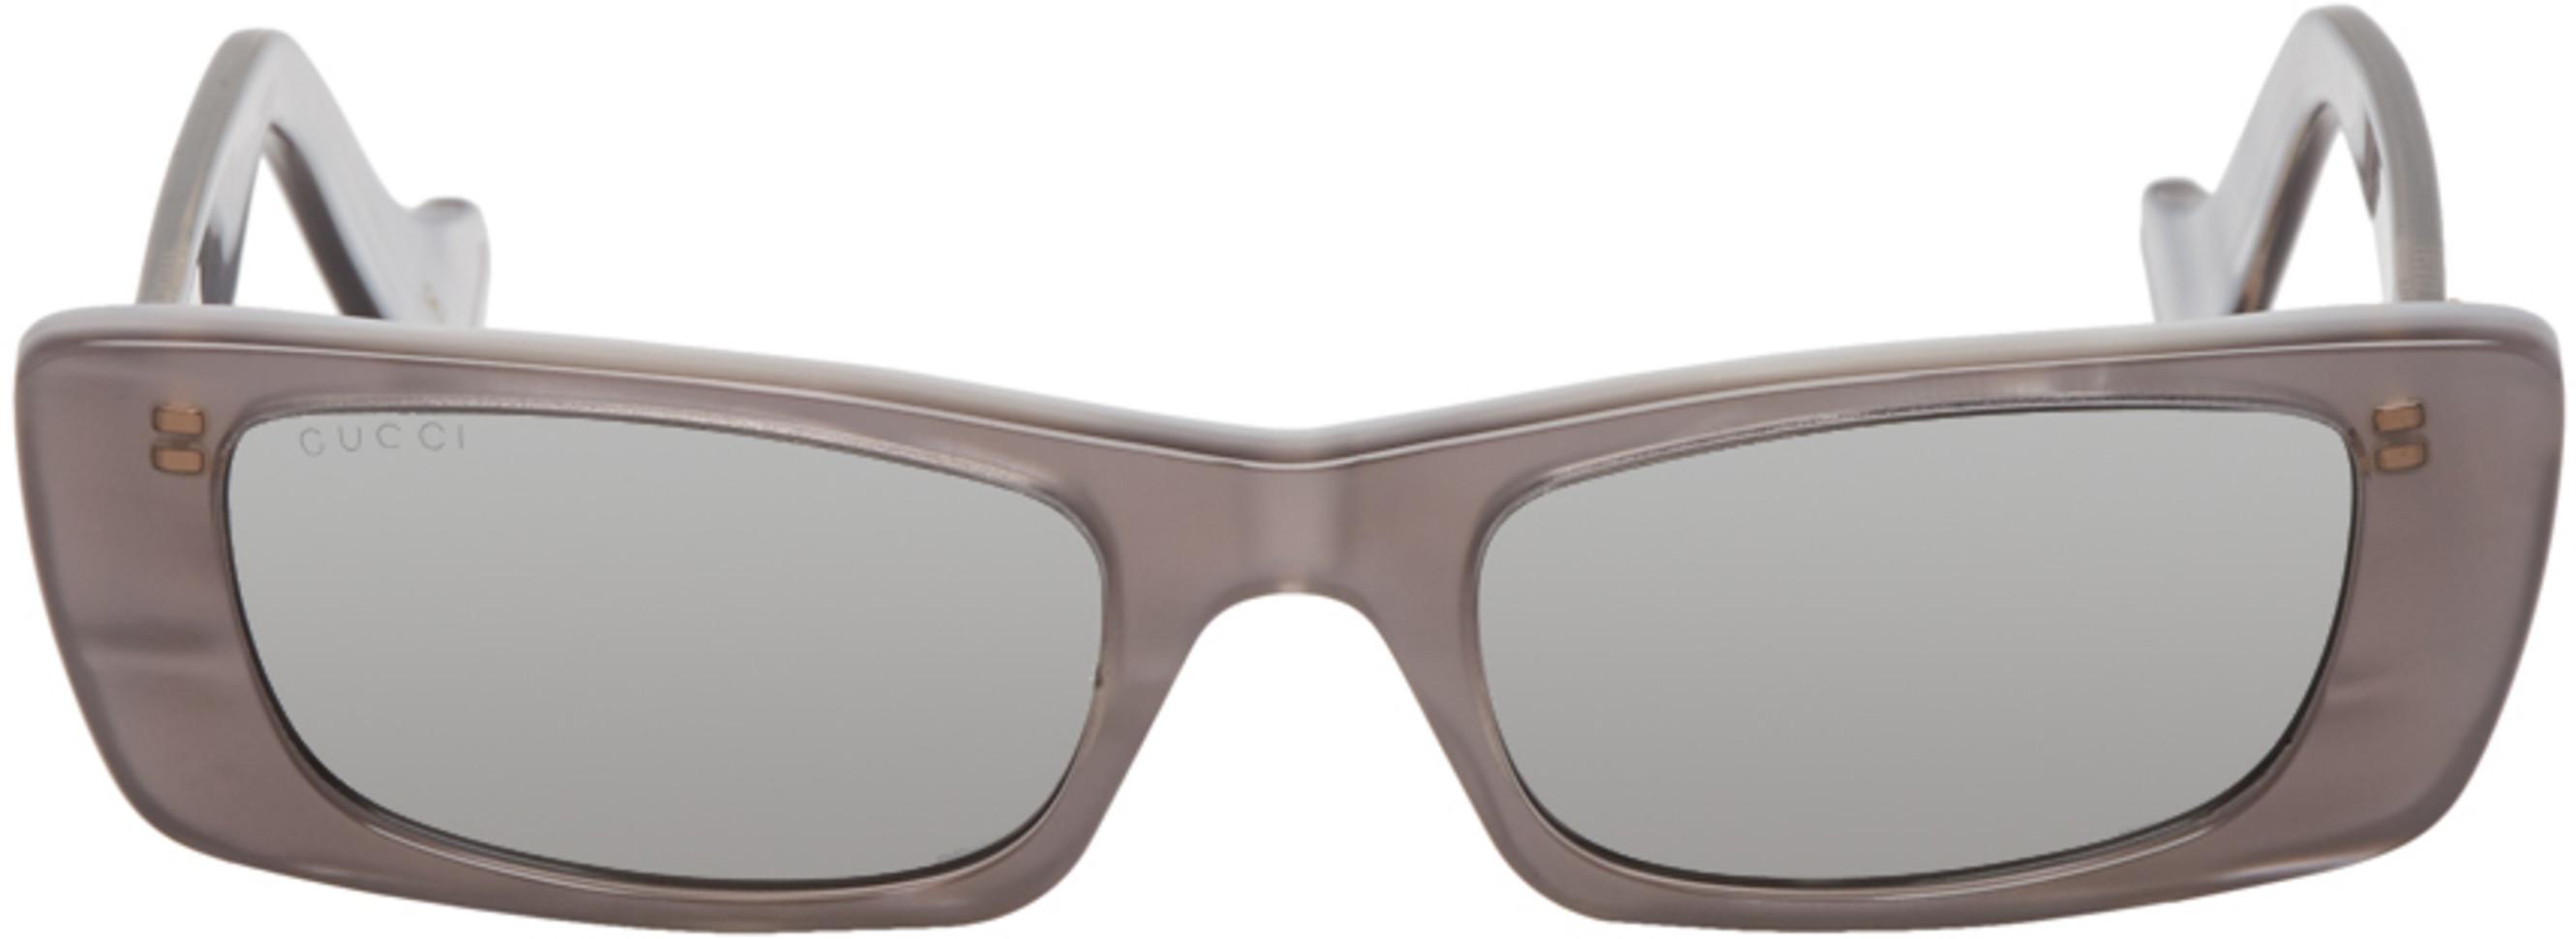 2d0378ef8b01 Gucci eyewear for Men | SSENSE